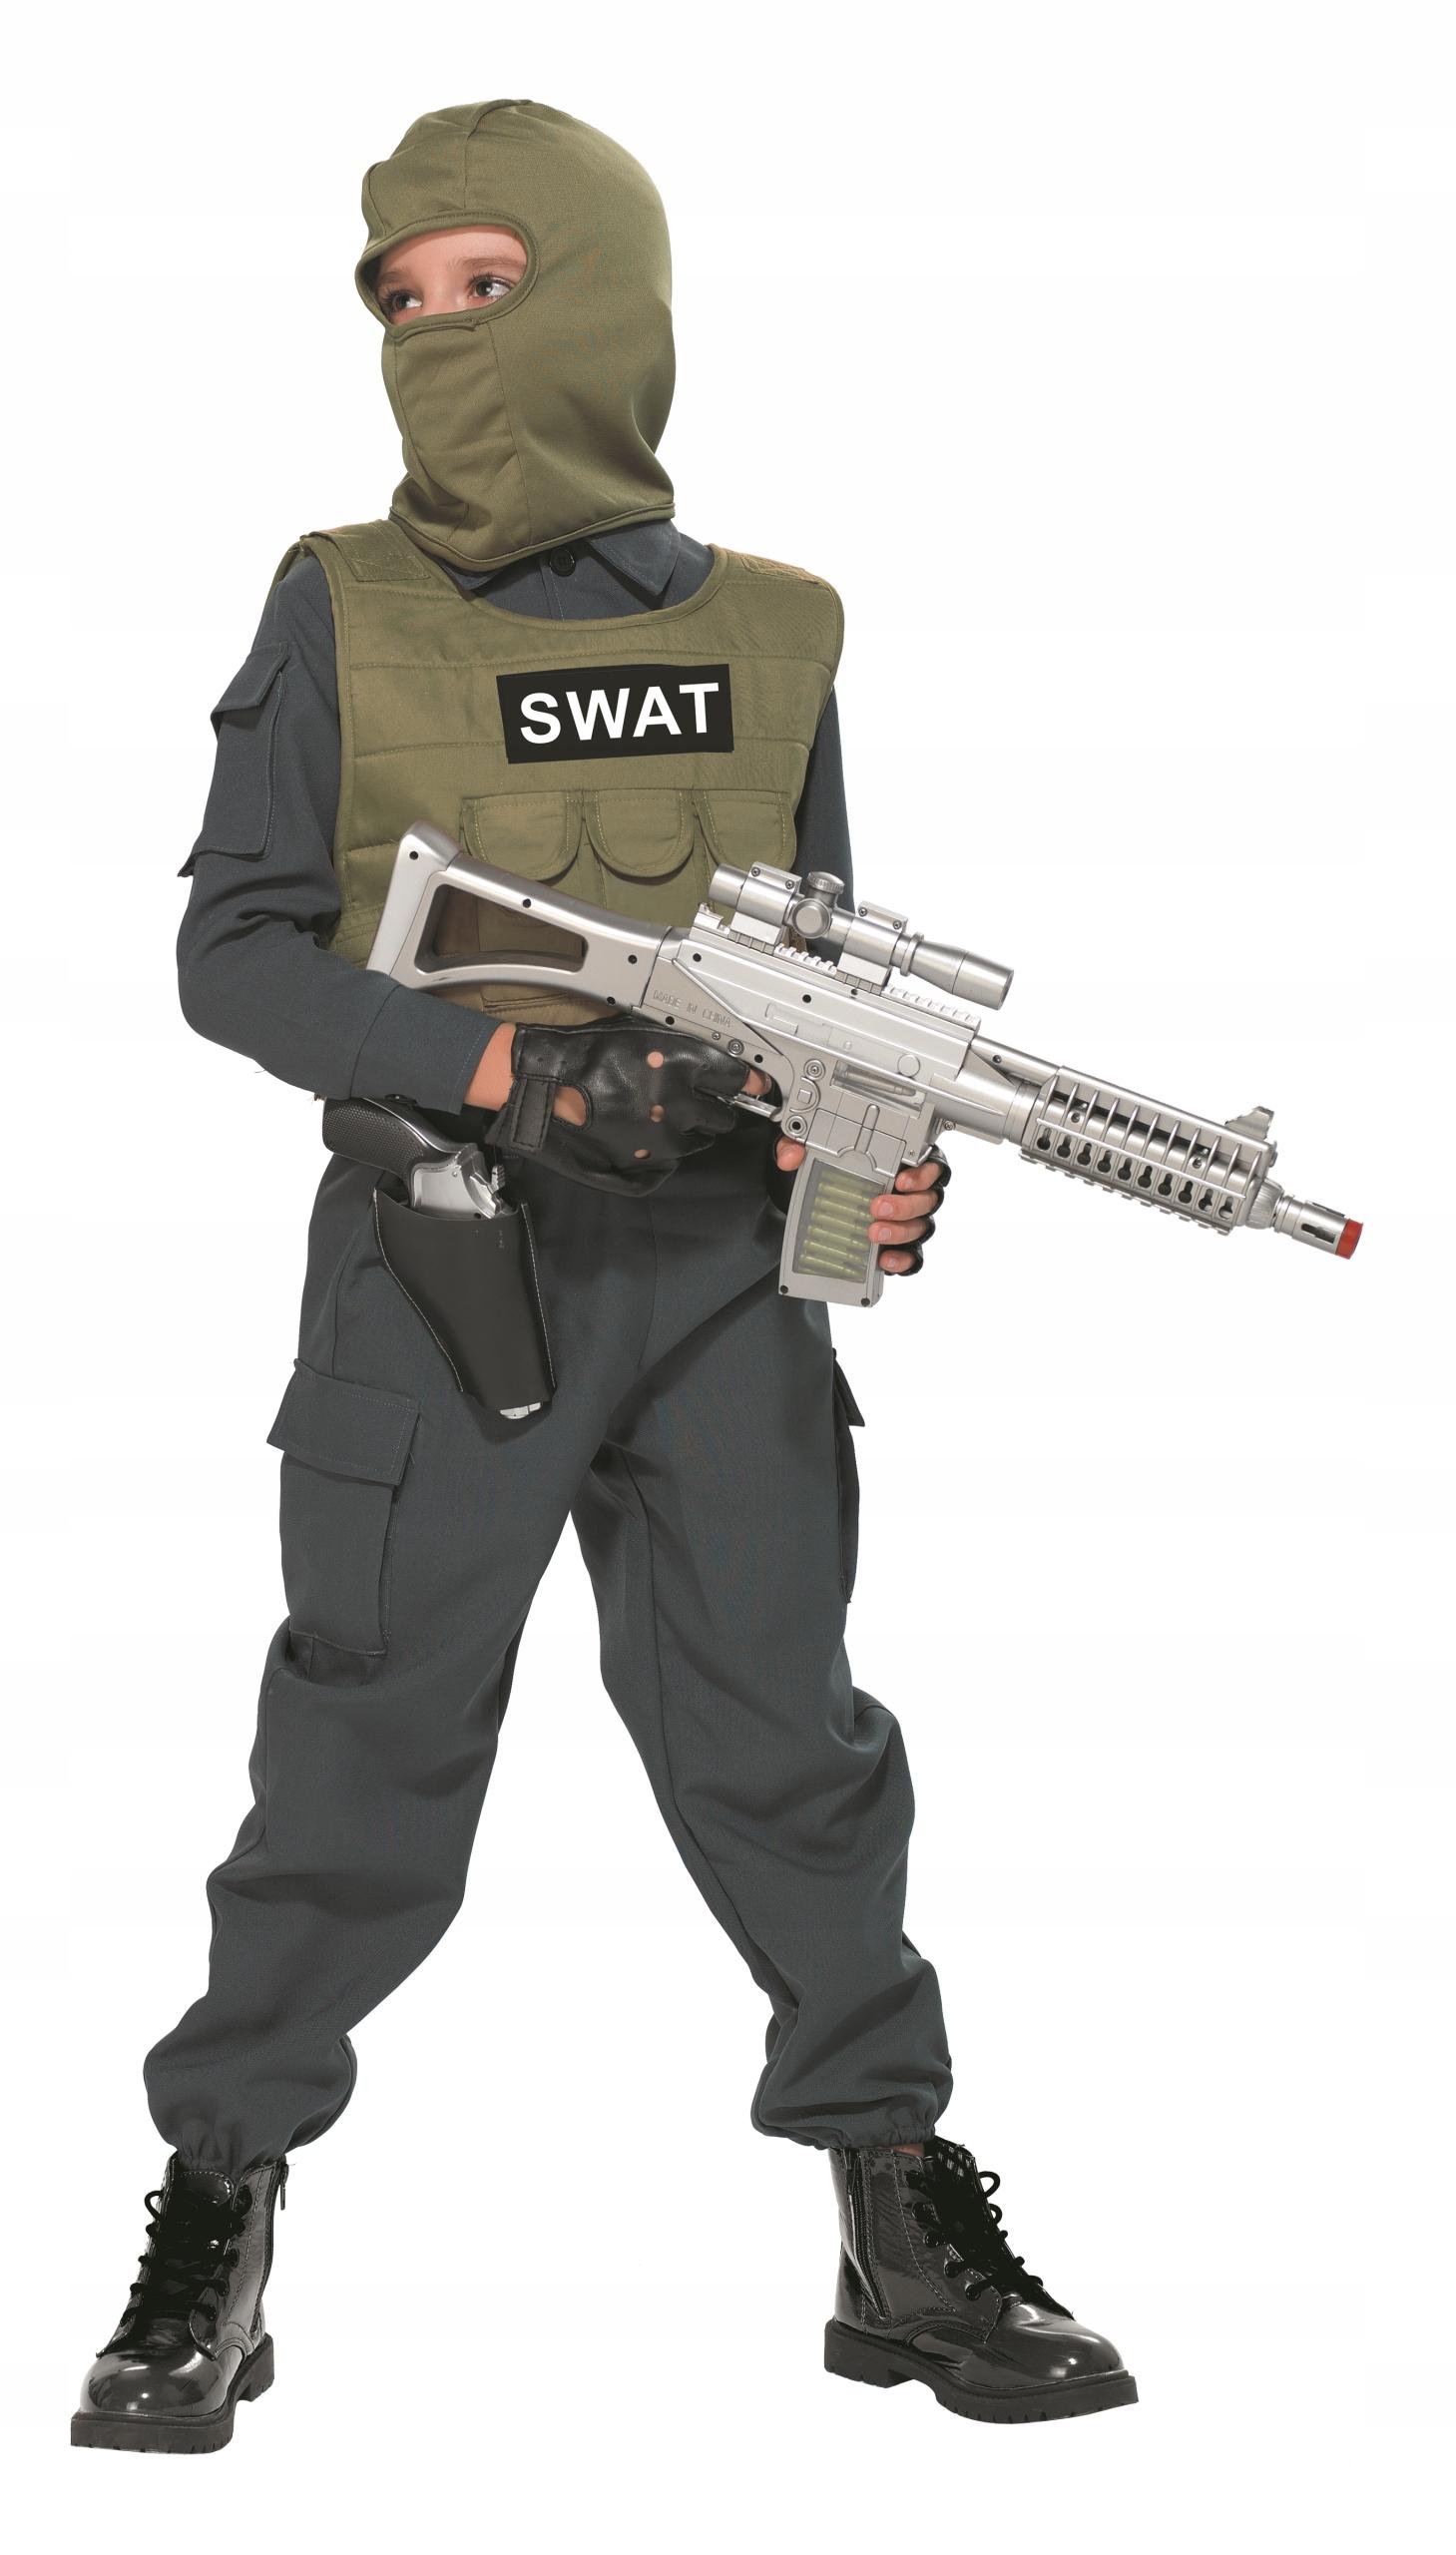 e38d5c40a80516 Policjant S.W.A.T SWAT Antyterrorysta 104 strój 7661568363 - Allegro.pl